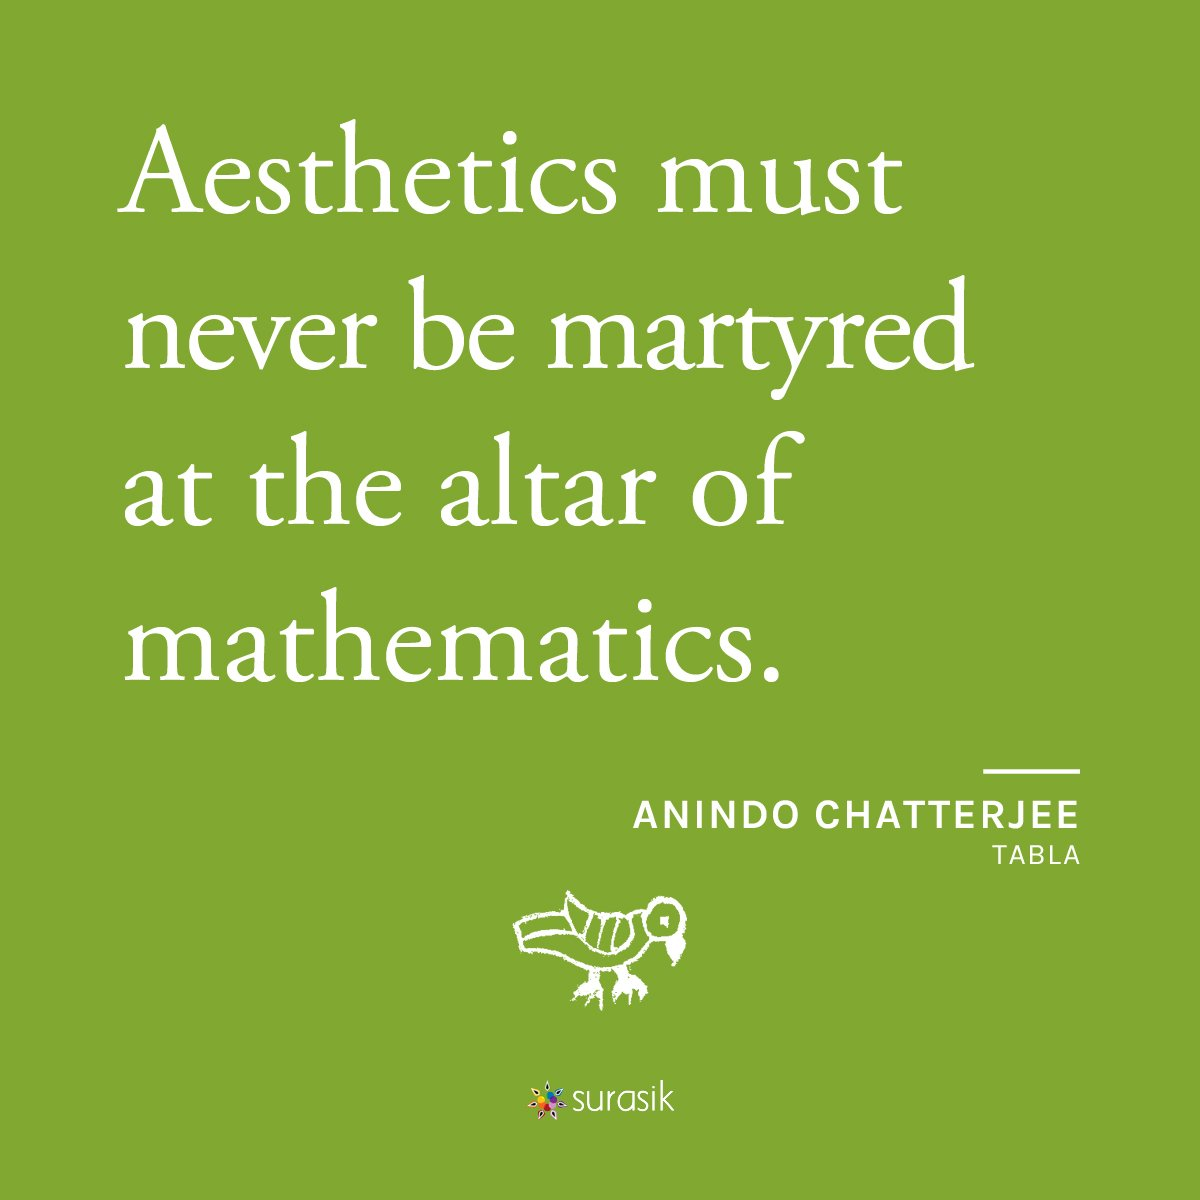 Don't make music a martyr, says Anindo Chatterjee.  @mytabla @tablaanubrata  #IndianMusic #Surasik #Tabla #AnindoChatterjee #quoteoftheday #ClassicalMusic #Icon #QOTD #WiseWords #FridayFeeling #IndianClassicalMusic #Inspiration #FarukhabadGharana #FridayMotivation #FridayThoughts https://t.co/BNkUYKvOtX